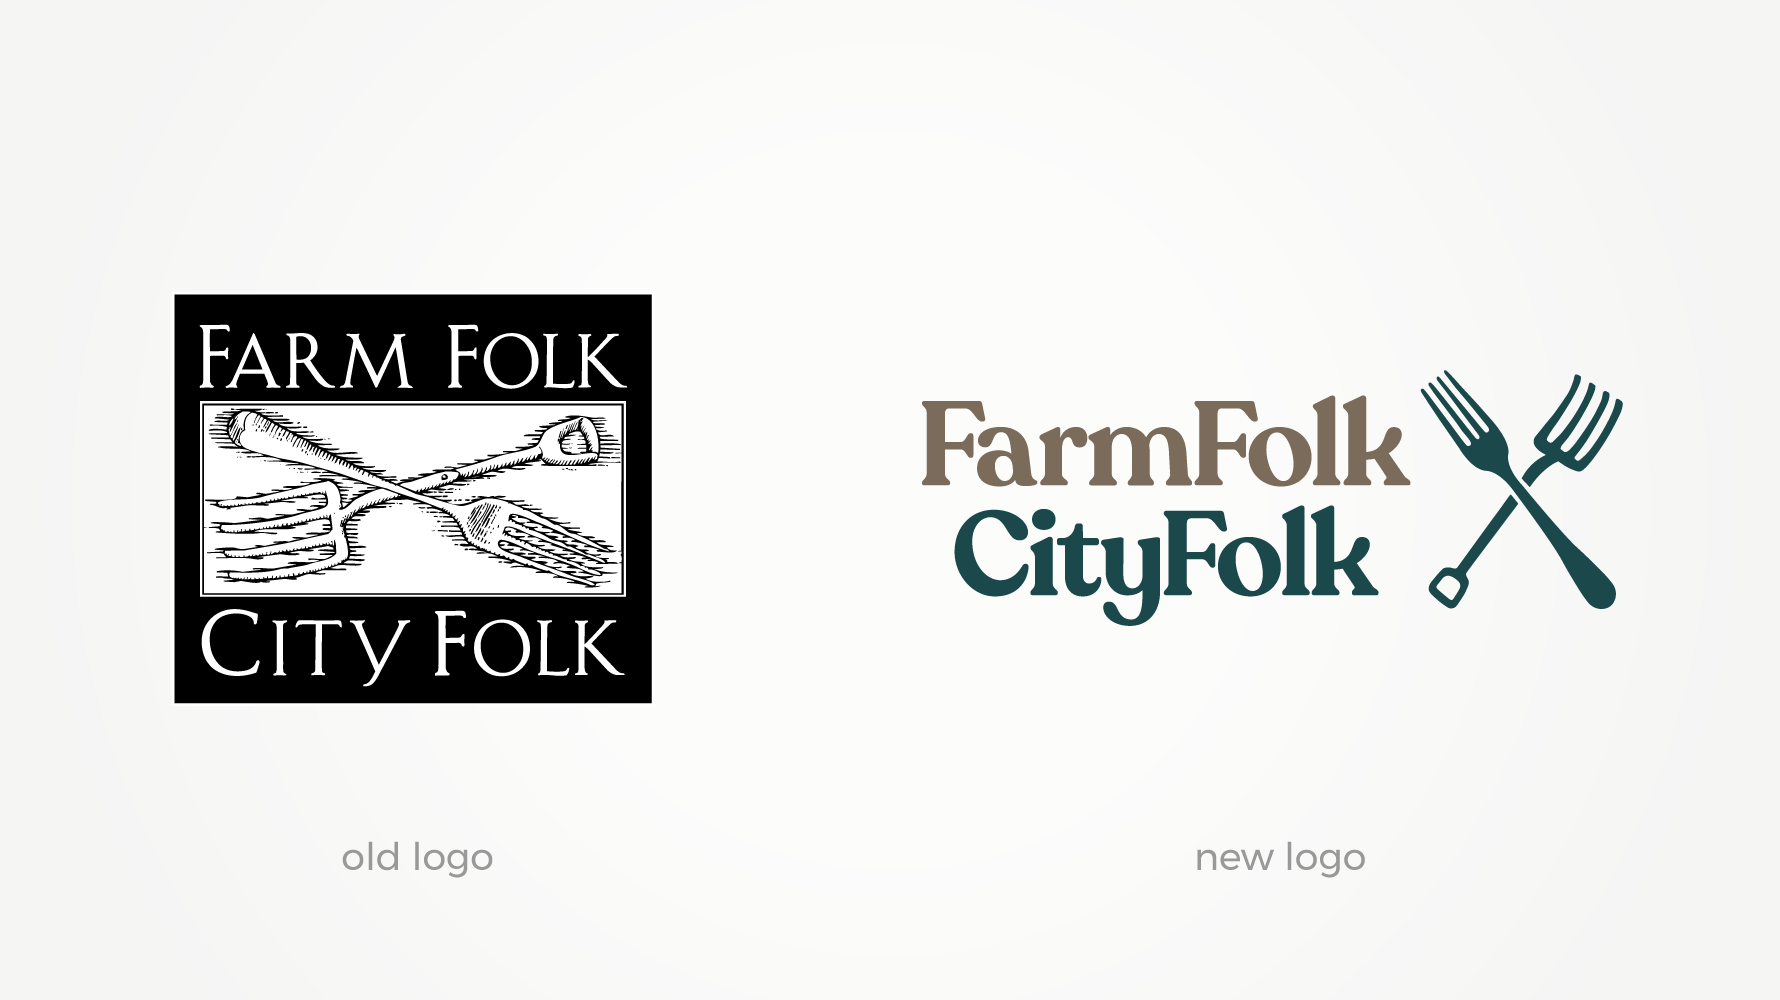 FarmFolk CityFolk old and new logos